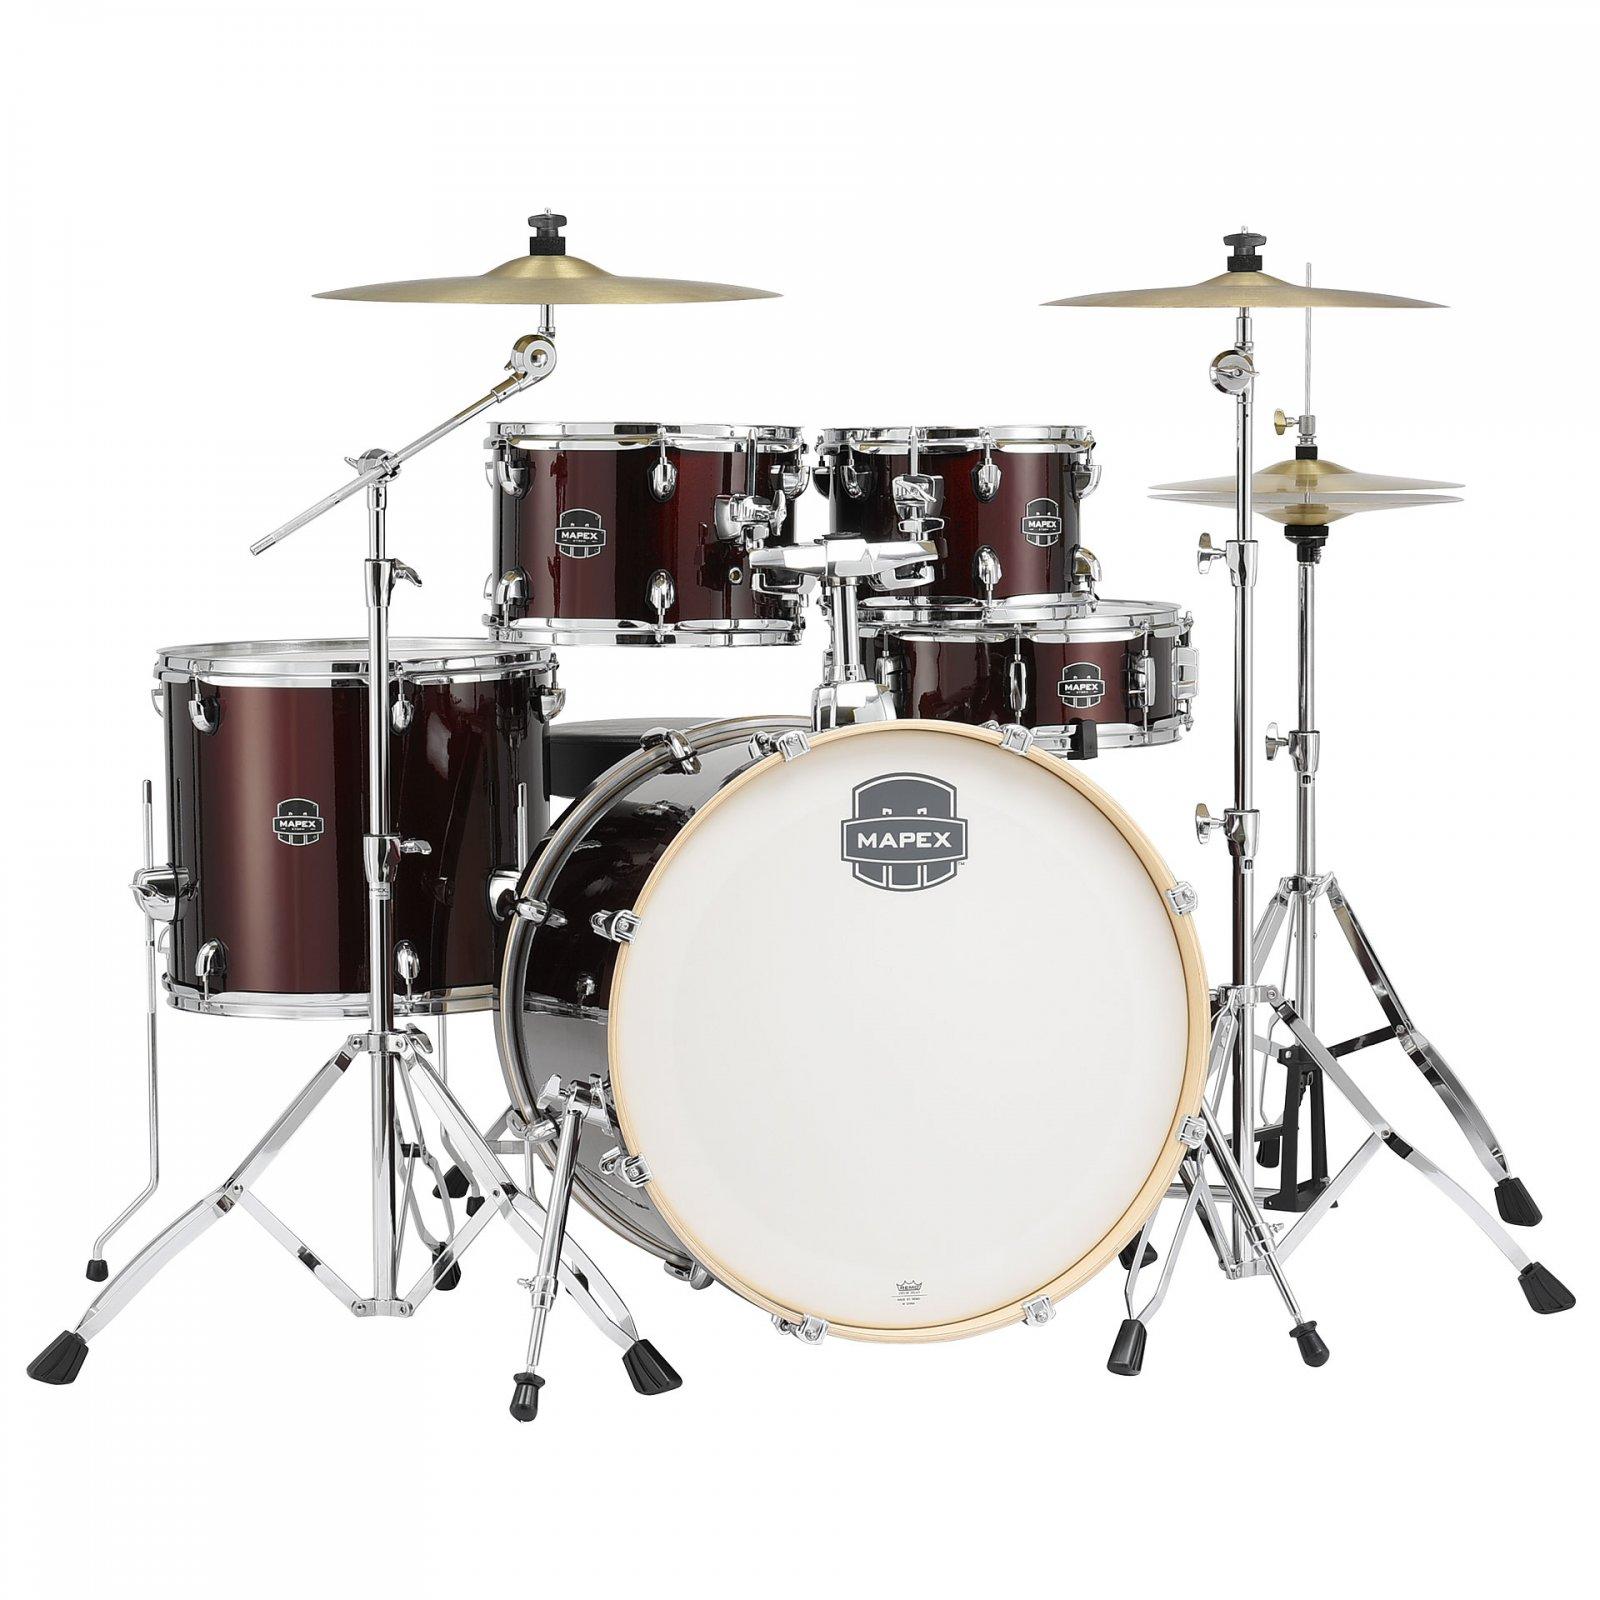 Mapex Storm Rock 5-Piece Drum Set w/ Hardware and Cymbals - Dark Red